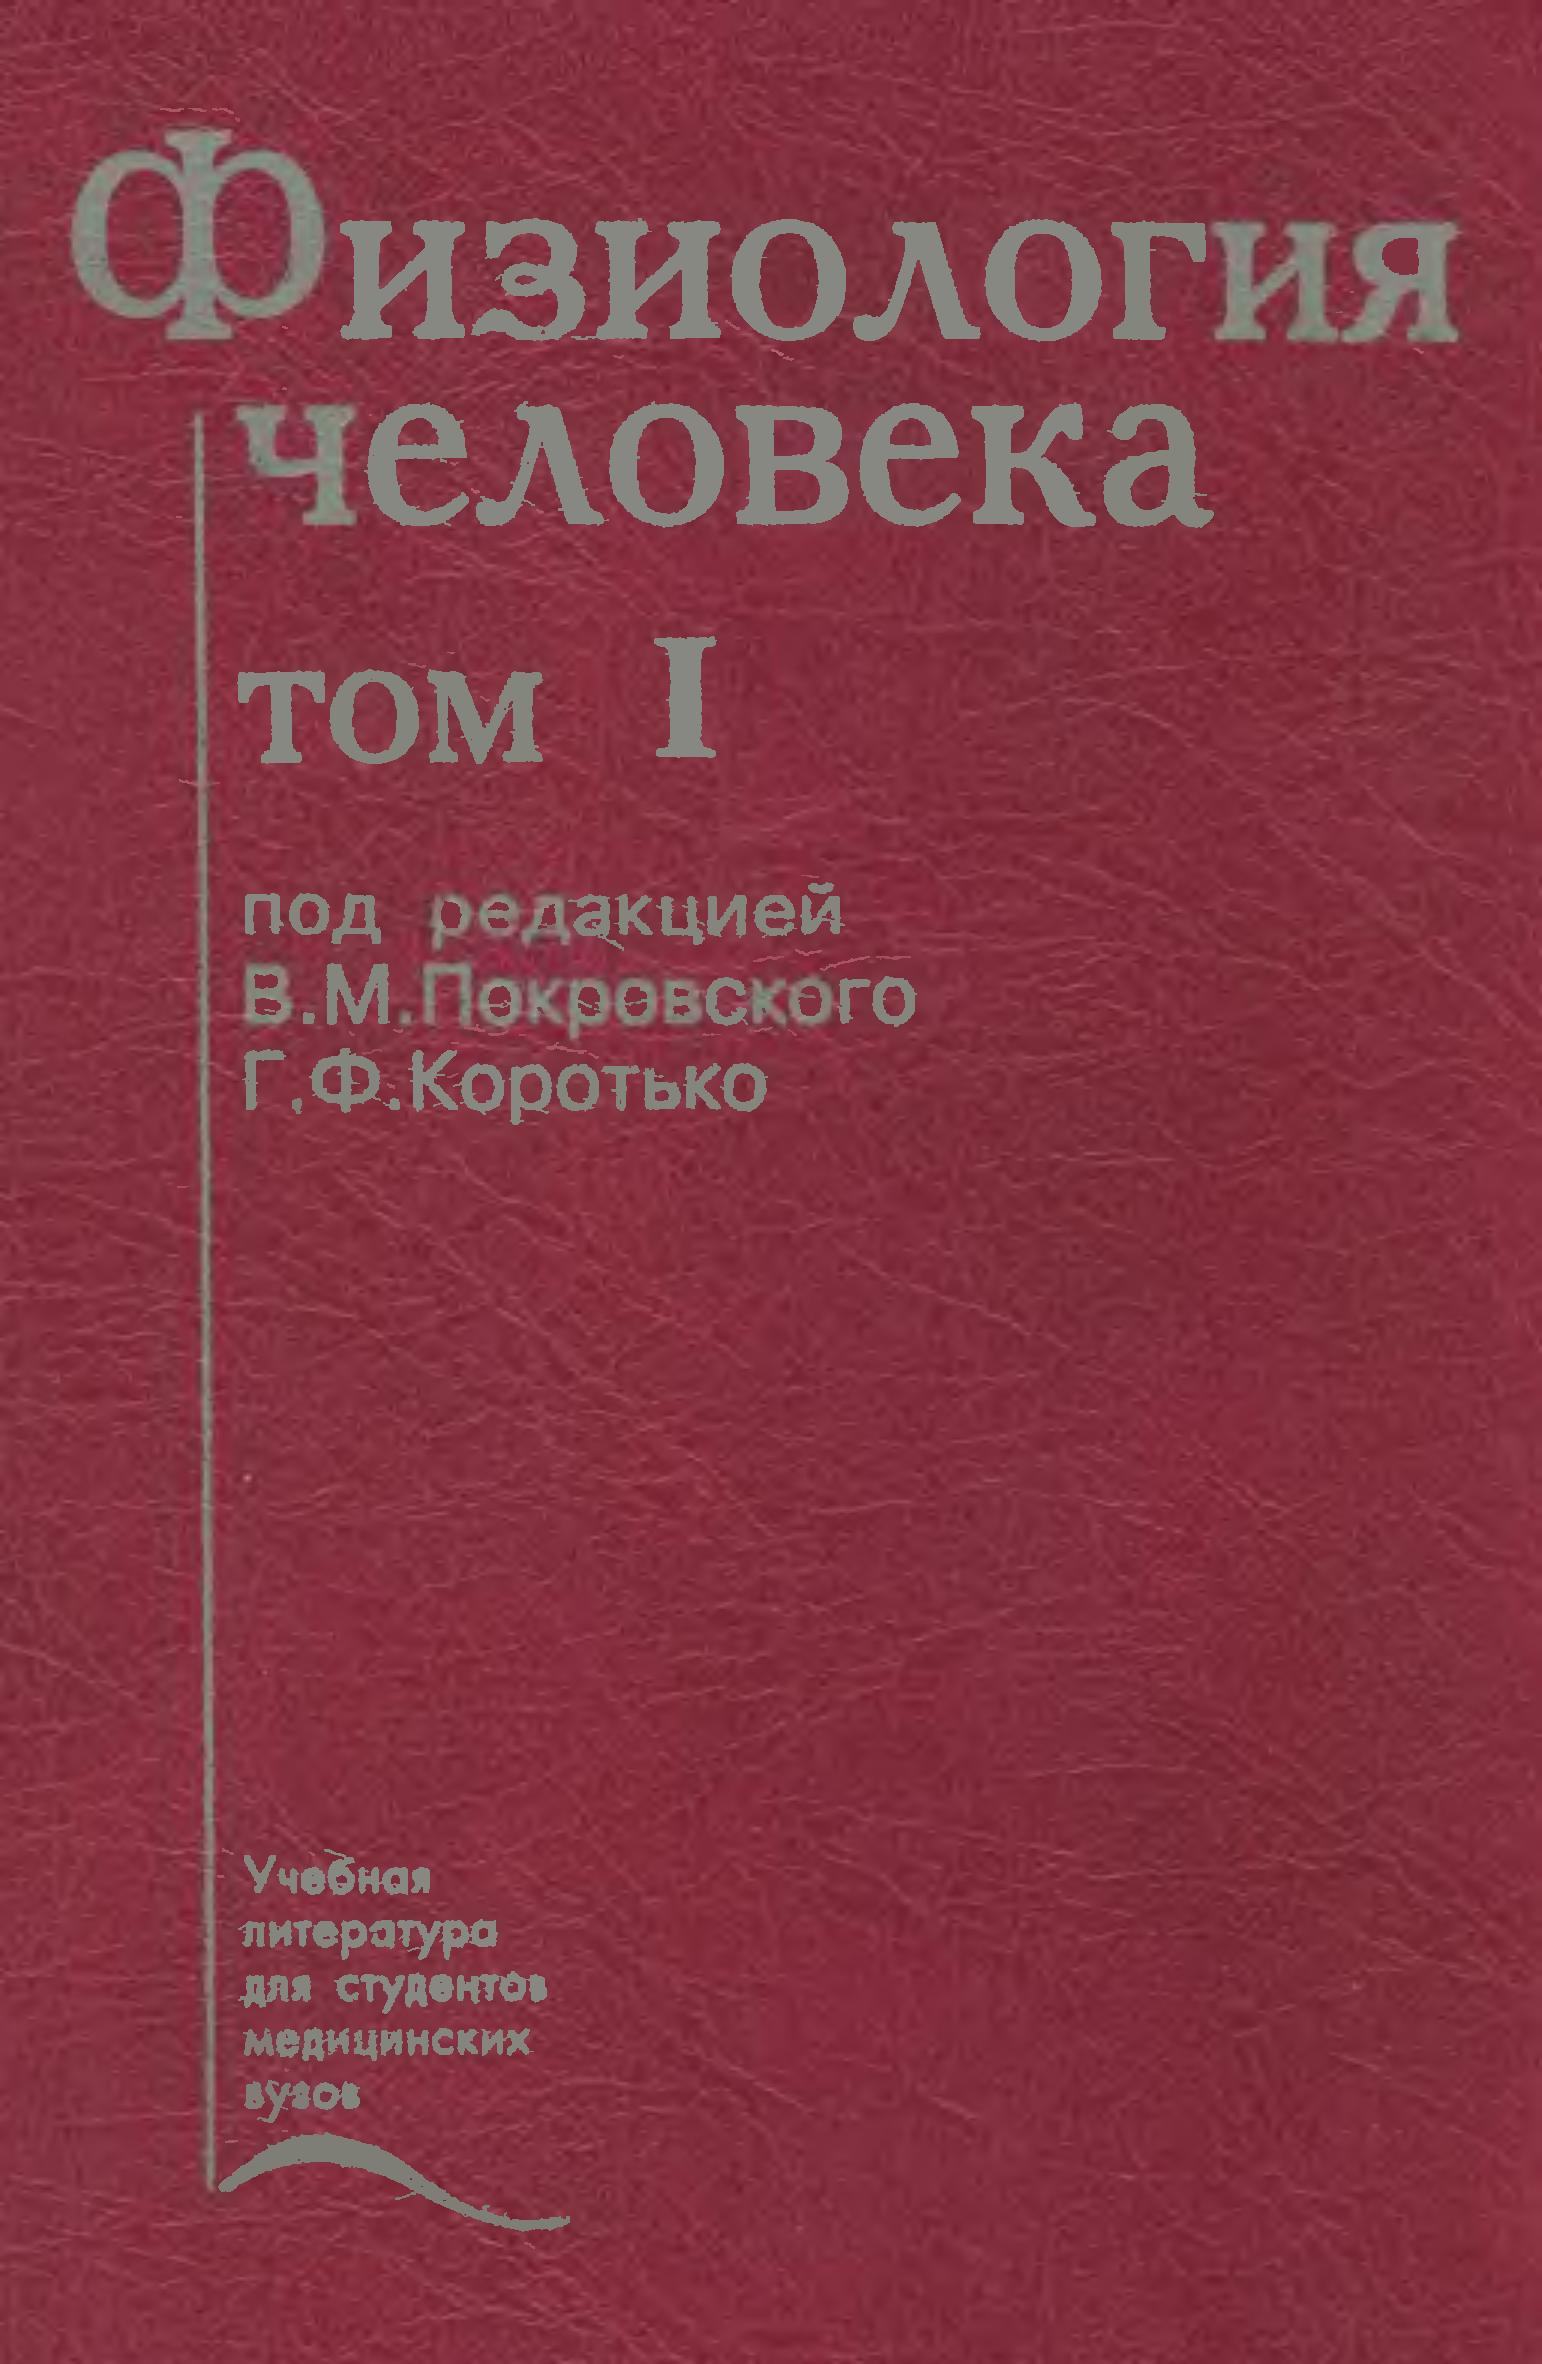 Учебник По Физиологии Агаджаняна